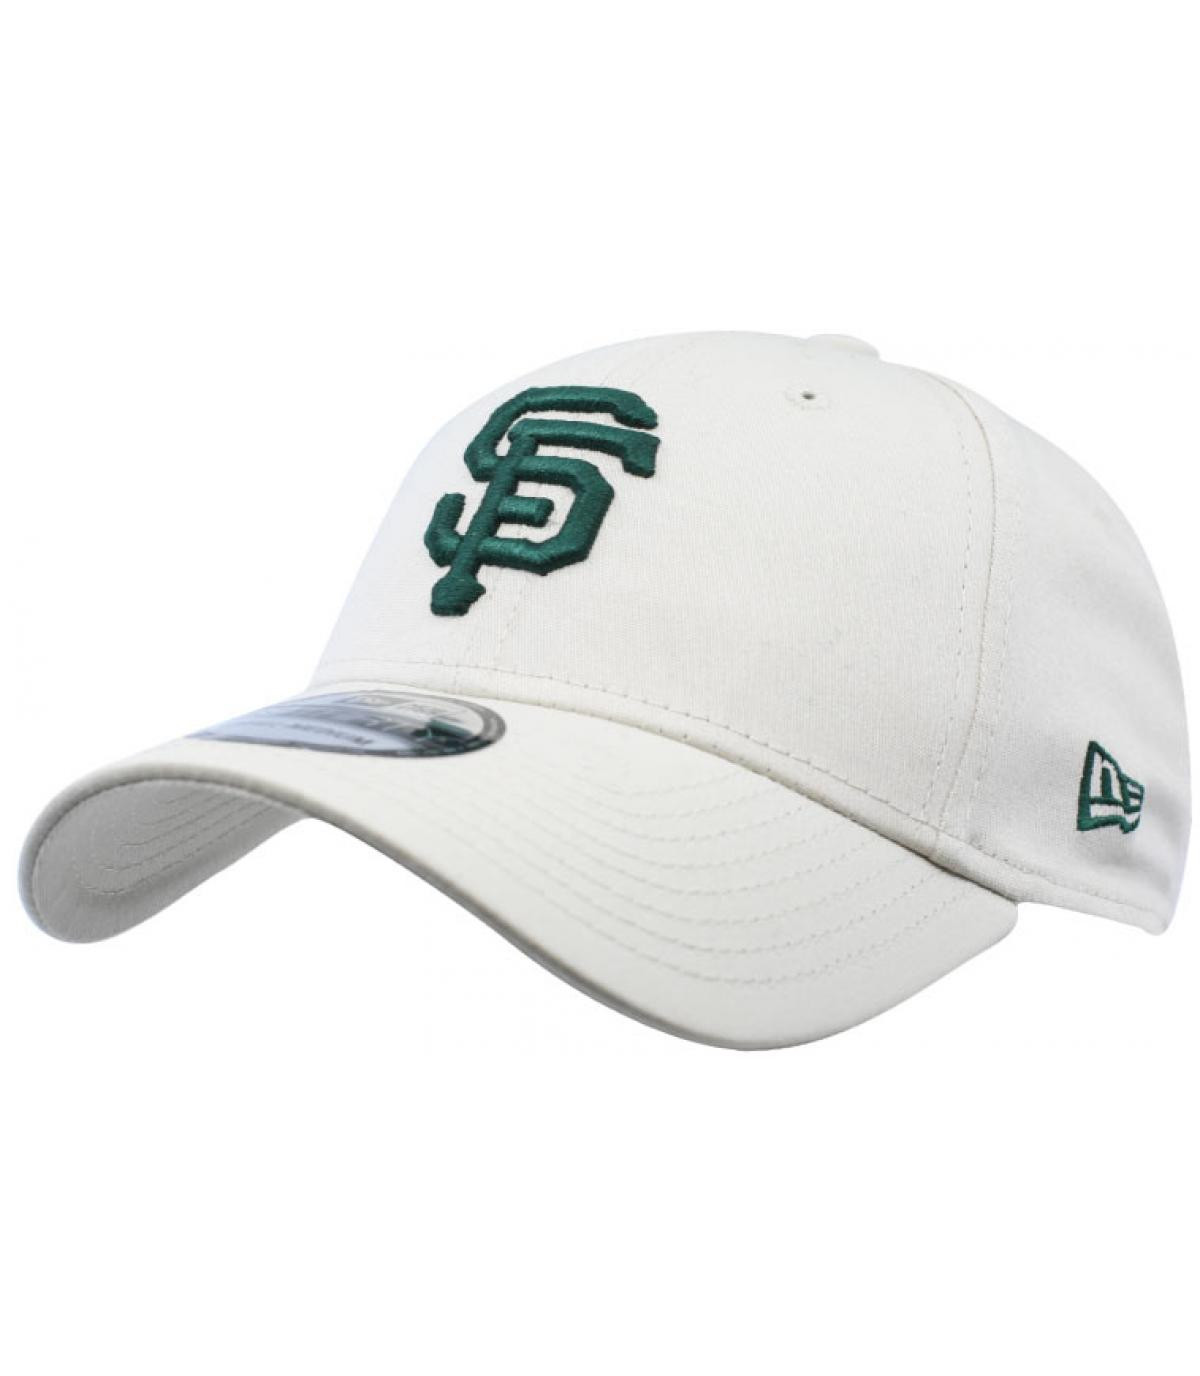 casquette SF gris vert